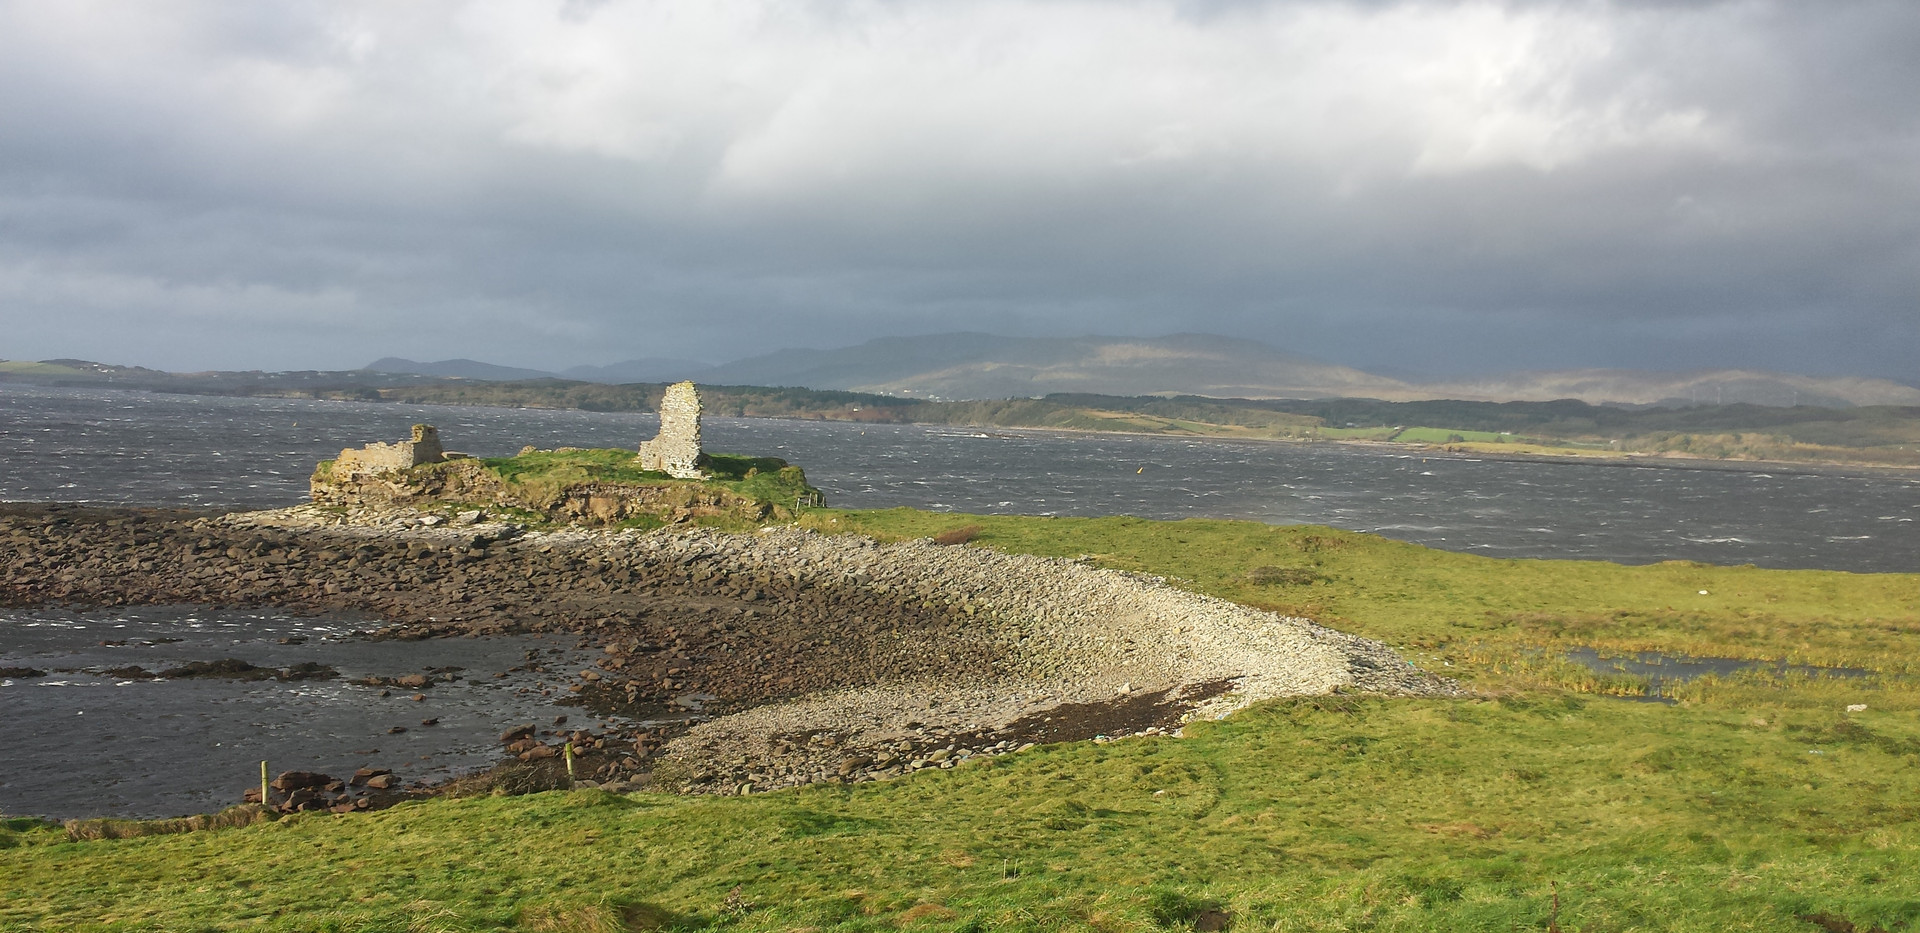 St. John's Point, Donegal